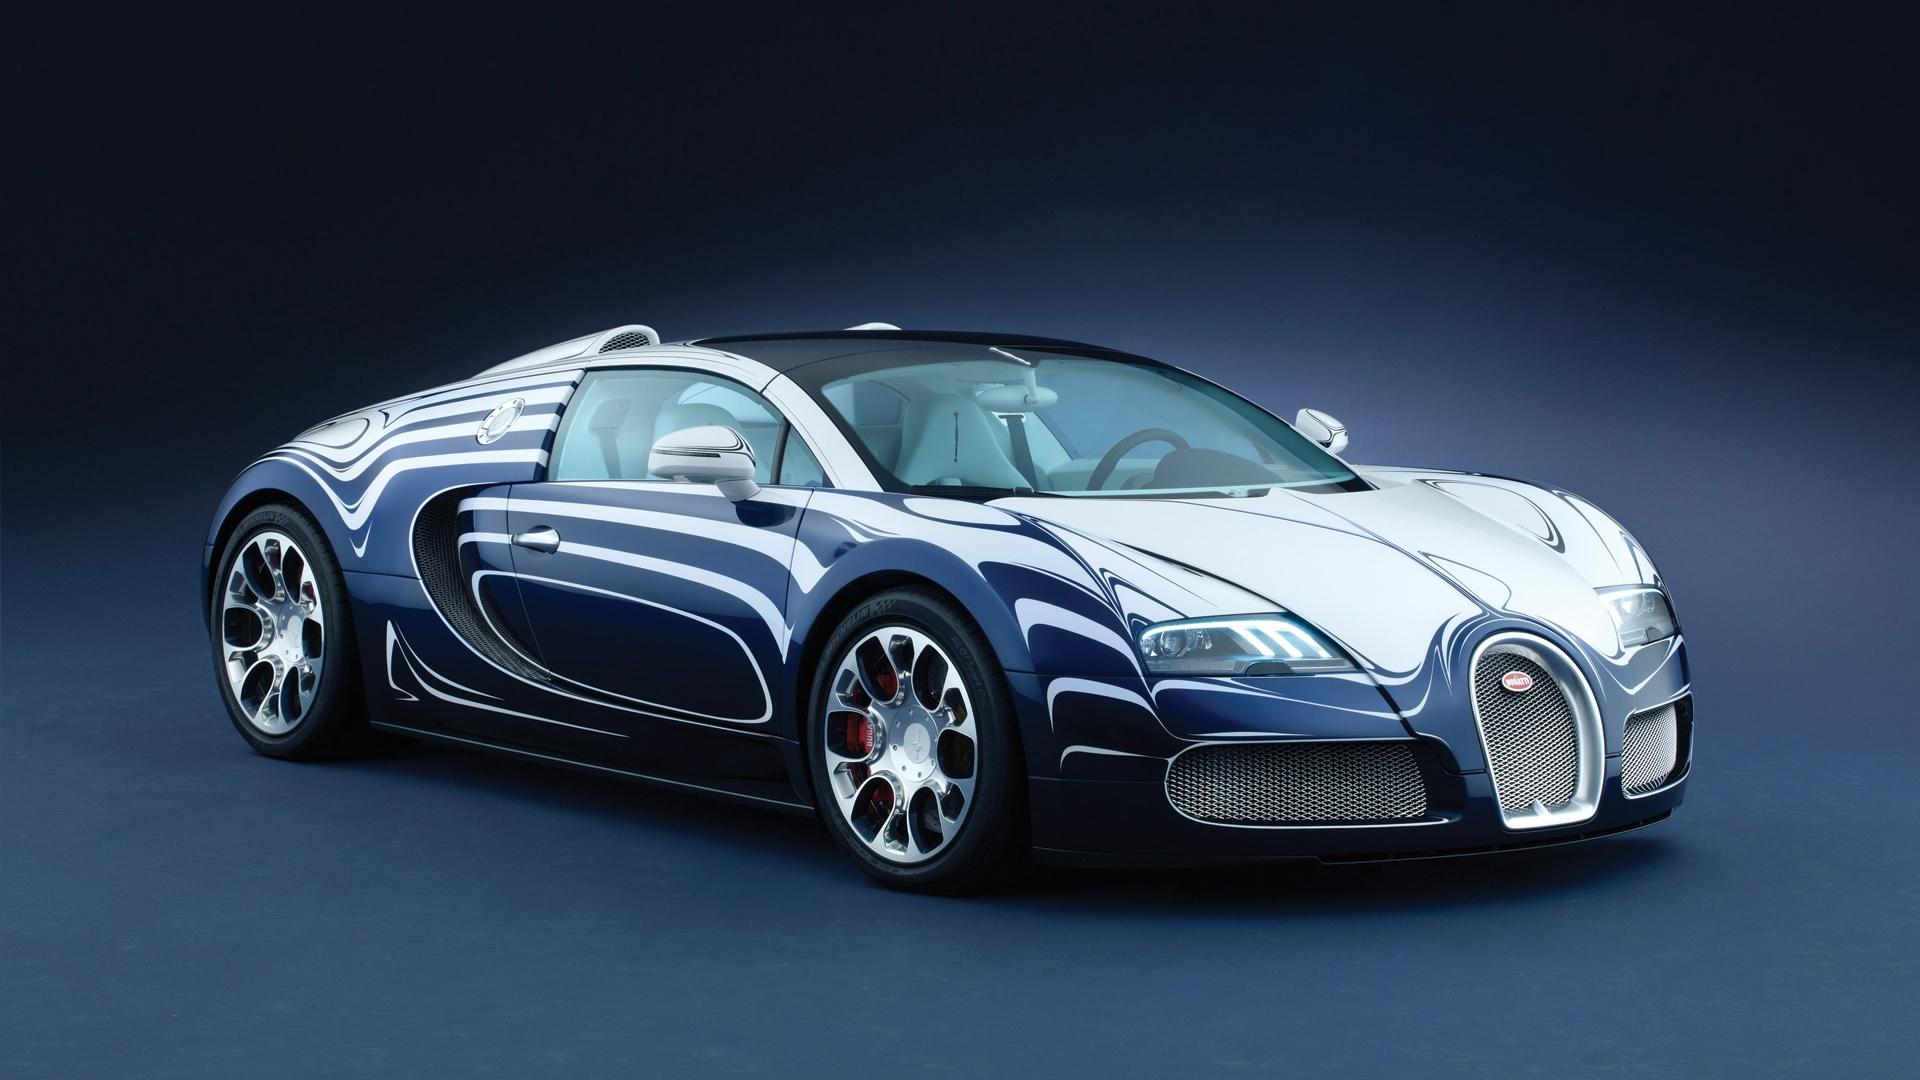 2014 Bugatti Veyron Super Sport Wallpaper Top Auto Magazine 1920x1080